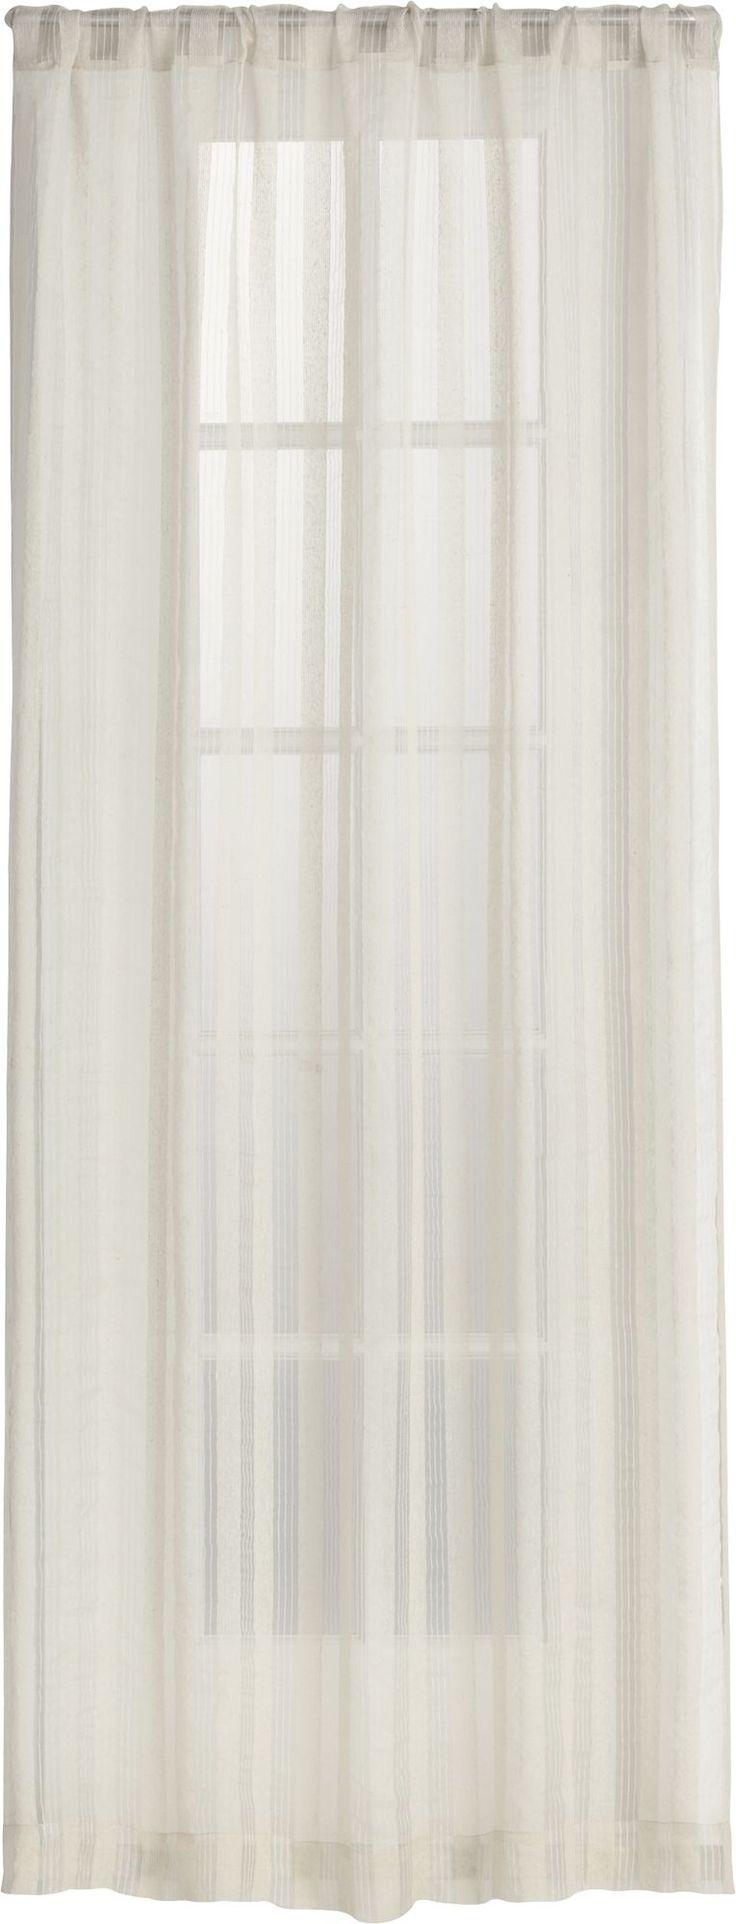 Antonia Sheer Curtain Panels